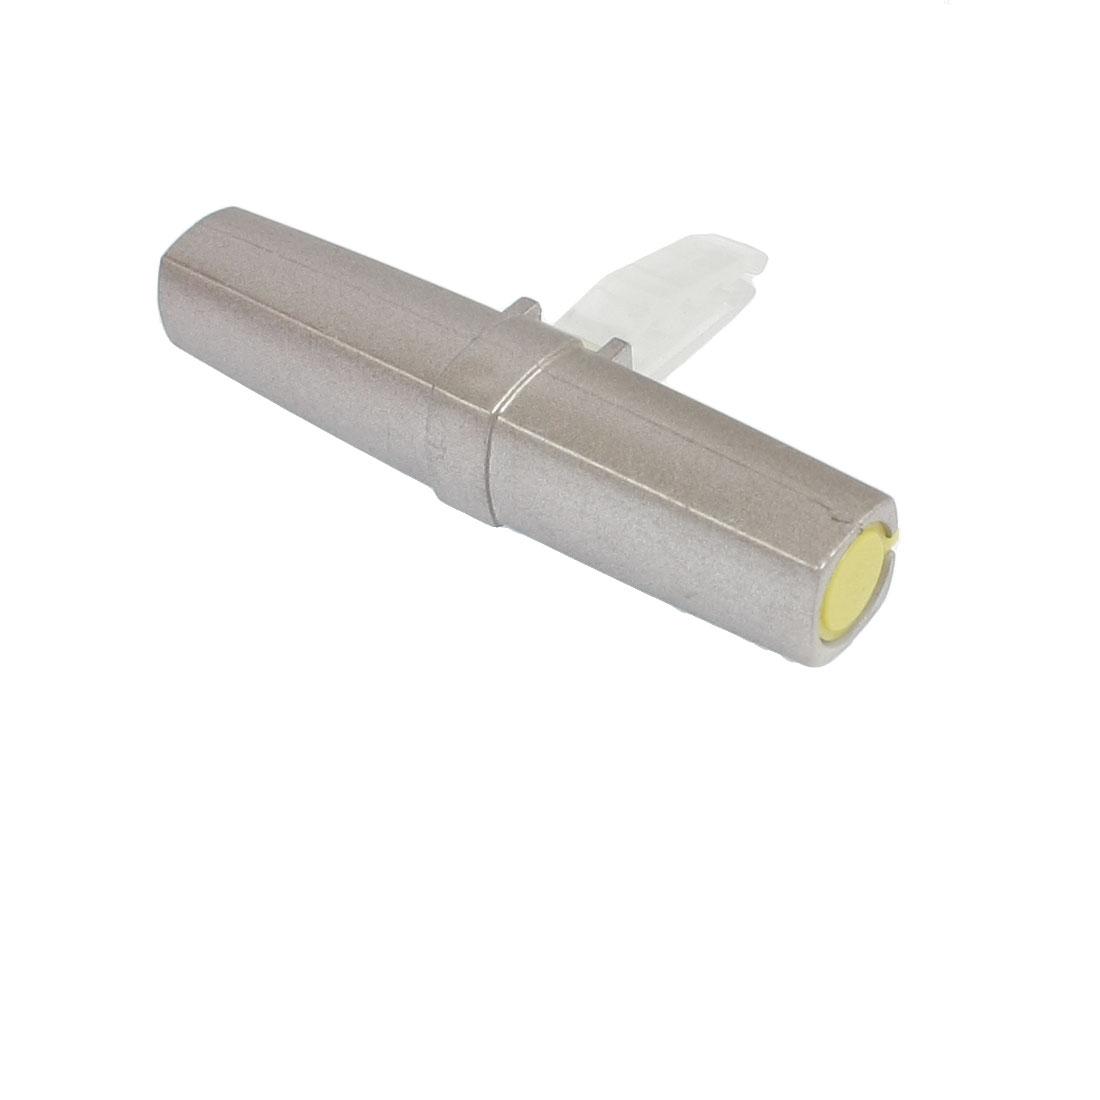 Silver Tone Plastic Shell Car Interior Vent Breeze Ocean Air Freshener